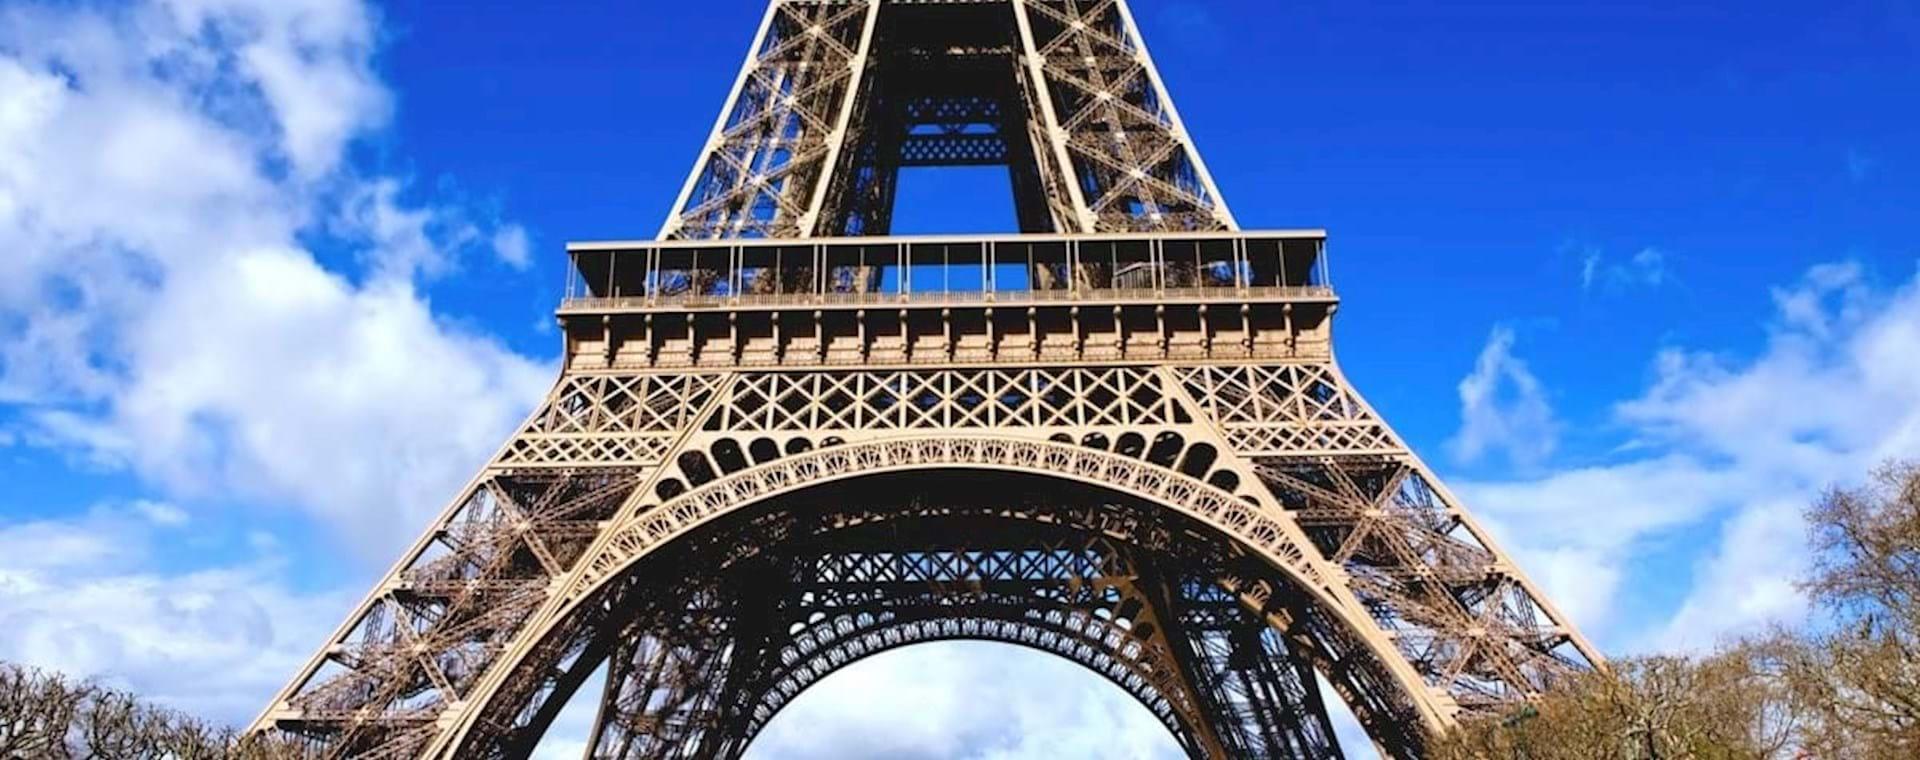 Eiffel Tower sunny day